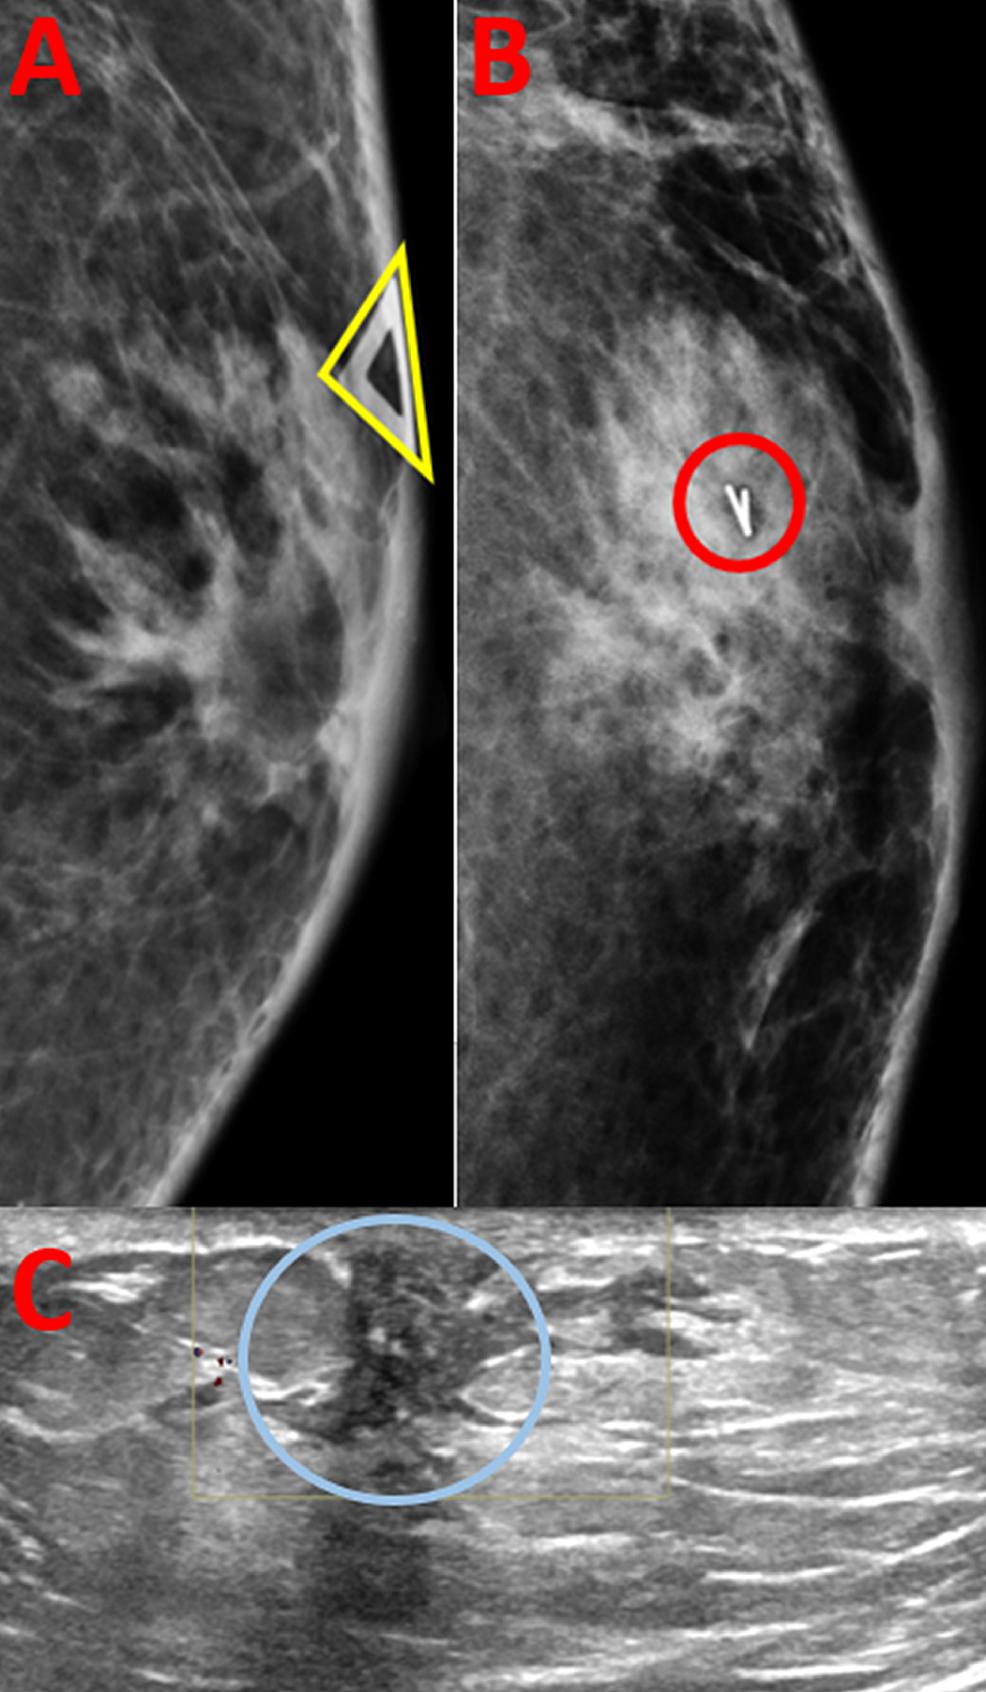 Imaging-Findings-of-Pseudoangiomatous-Stromal-Hyperplasia